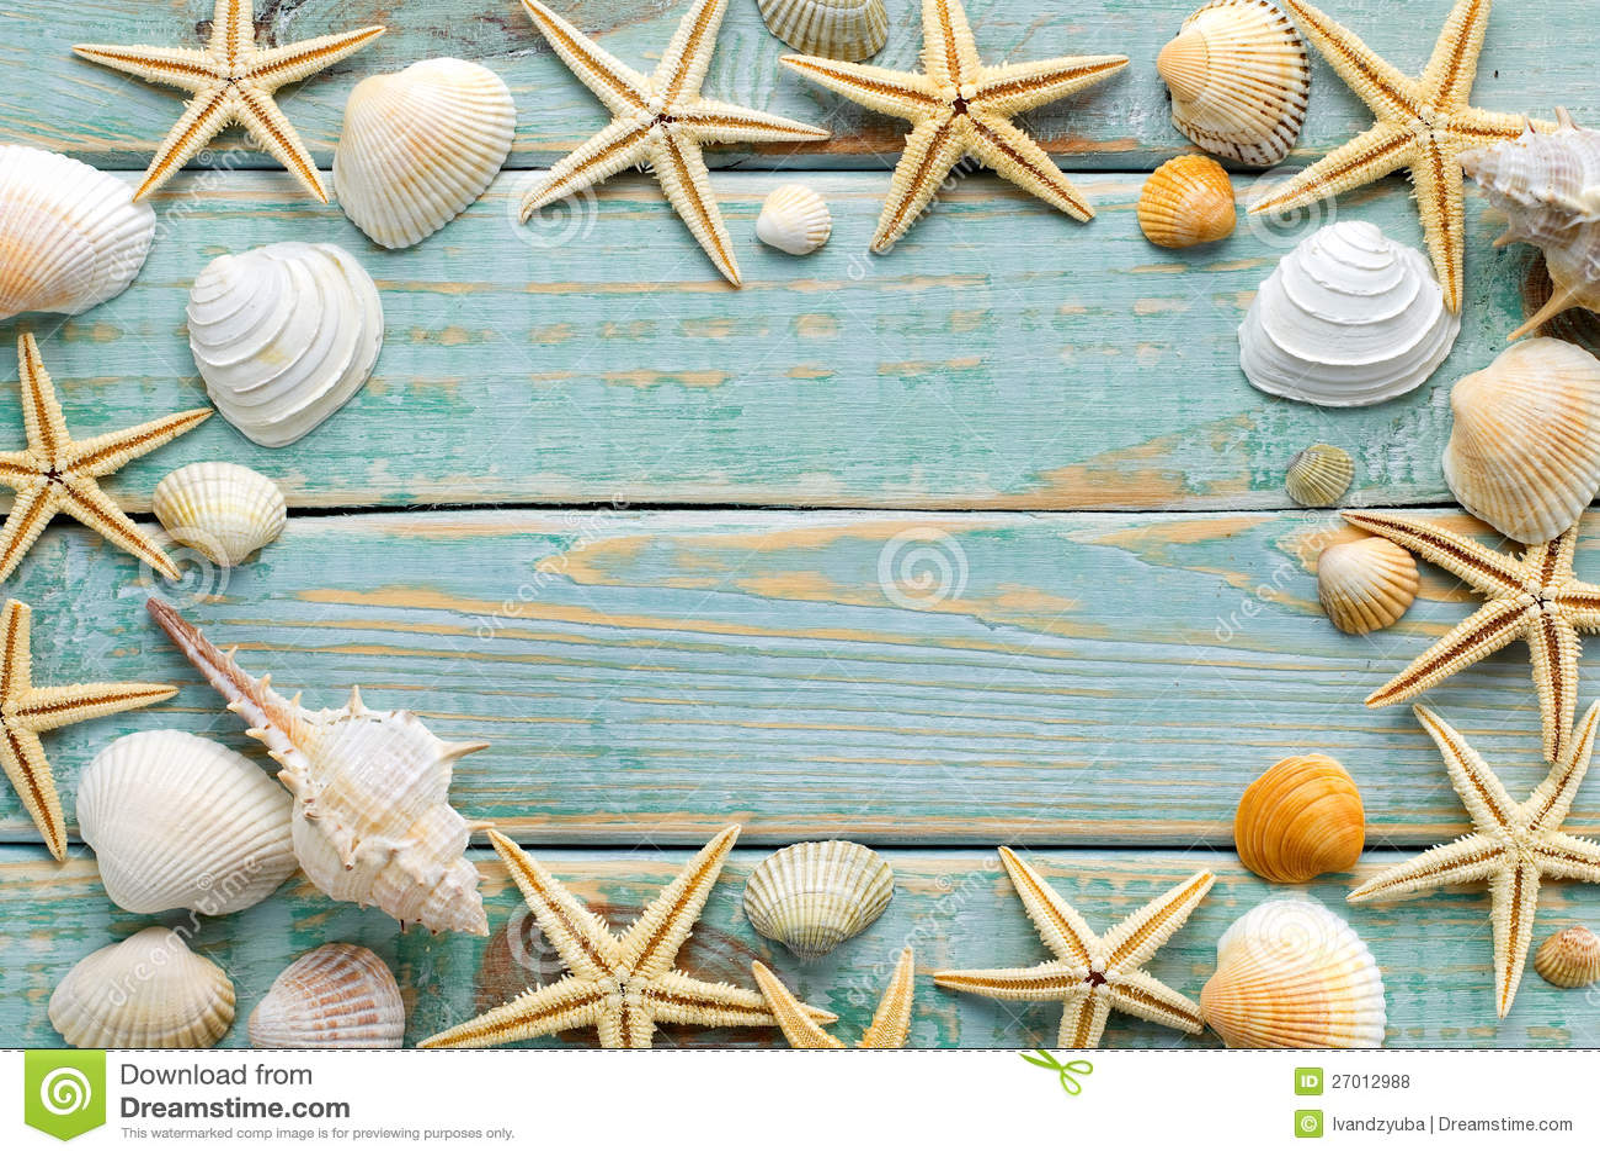 Sea Shells Frame Royalty Free Stock Photos Image 27012988